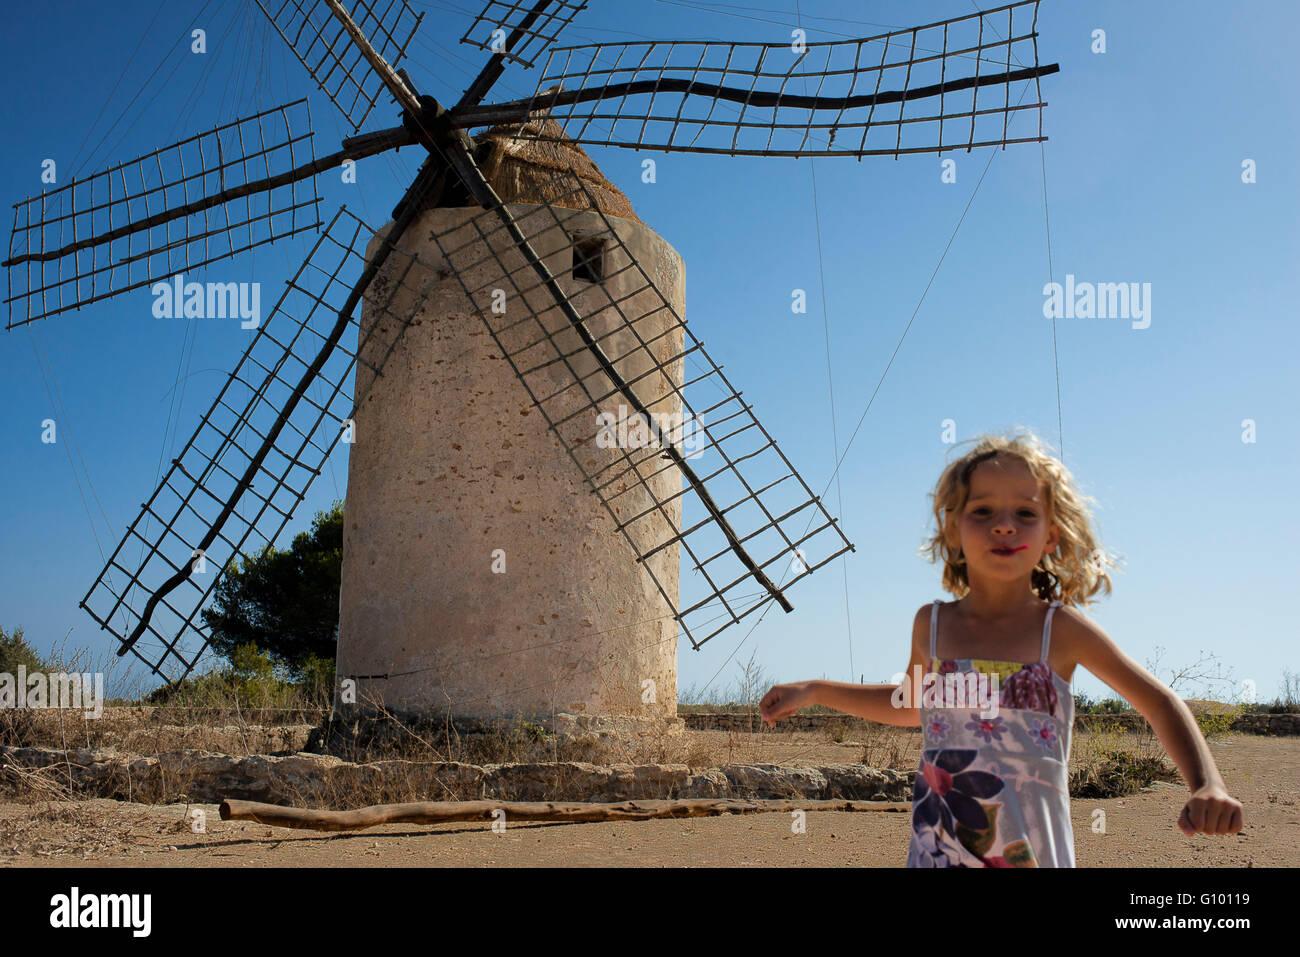 Funy girl in the windmill, Formentera, Balearic Islands, Spain. Old Windmill in el Pilar de la Mola on the island - Stock Image